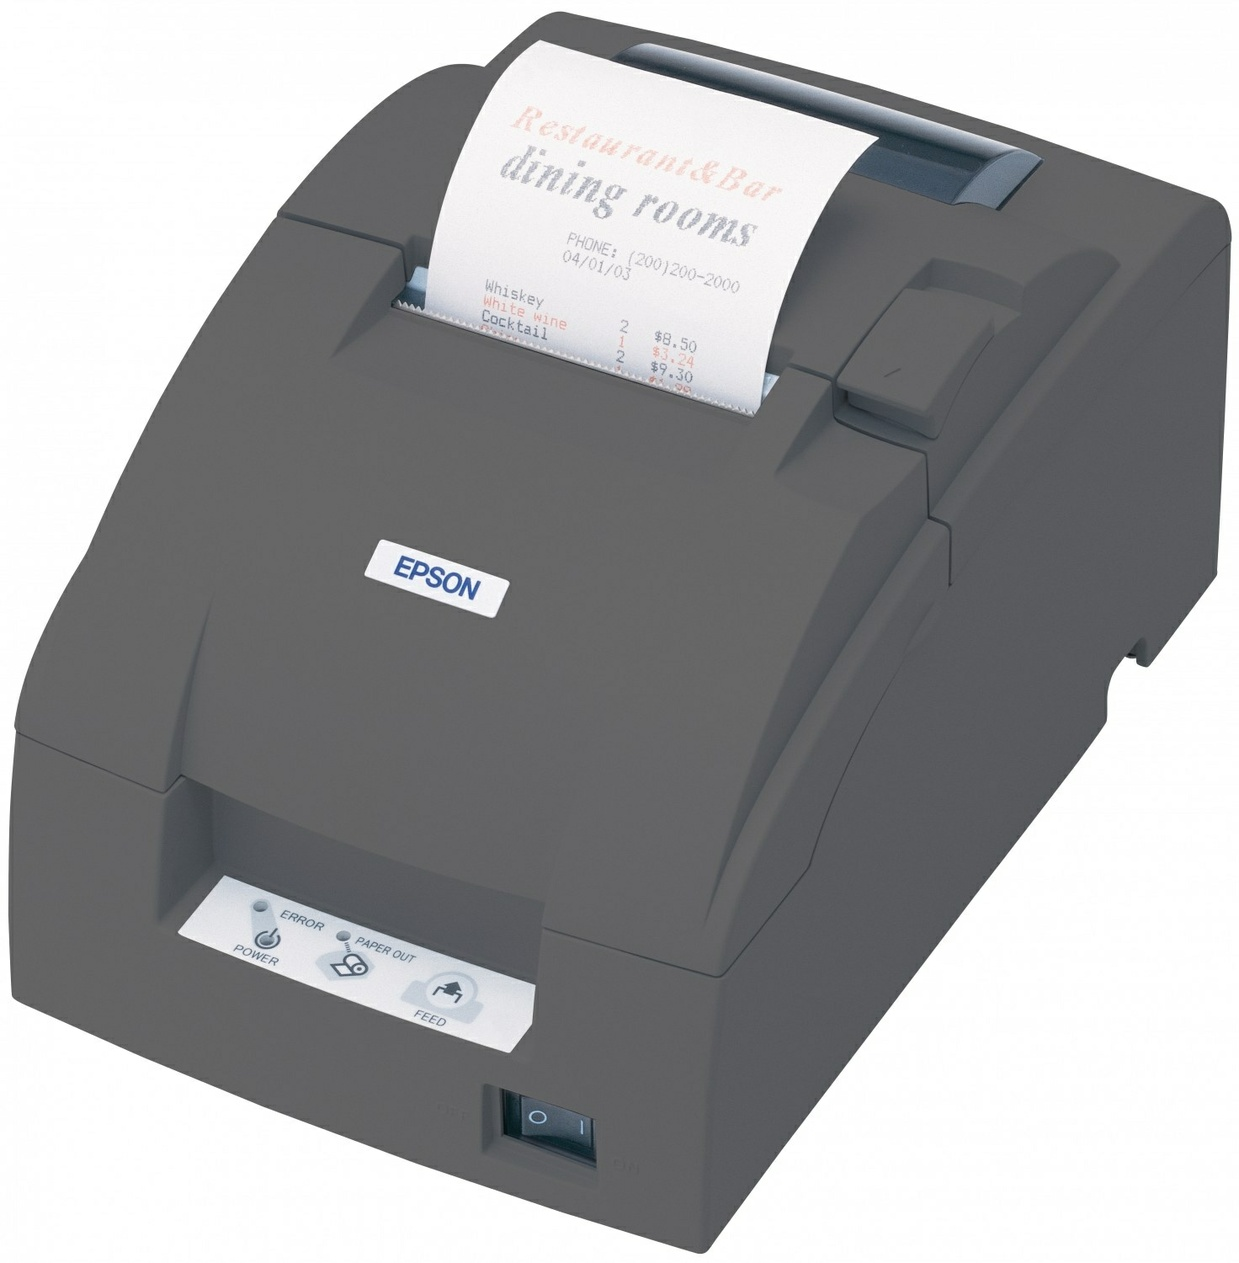 Epson TM-U220 Series (Type A) Roll-Tape Printer Service Repair Manual